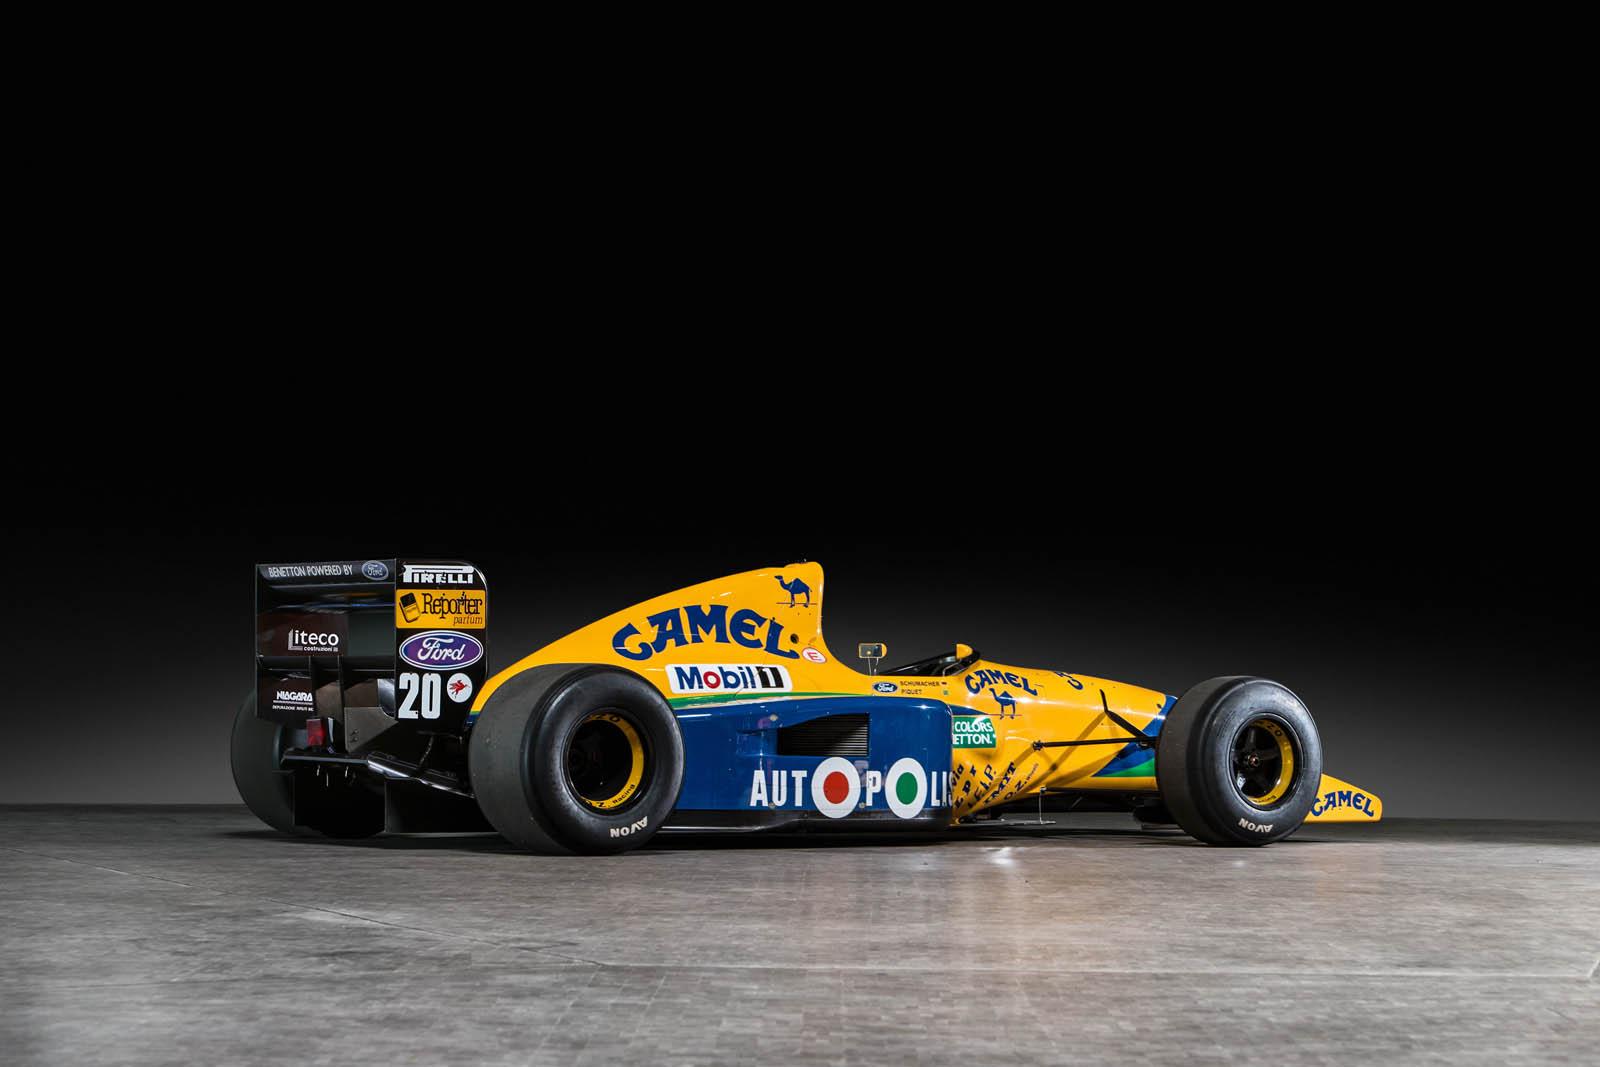 1991_Benetton-Ford_B191_11